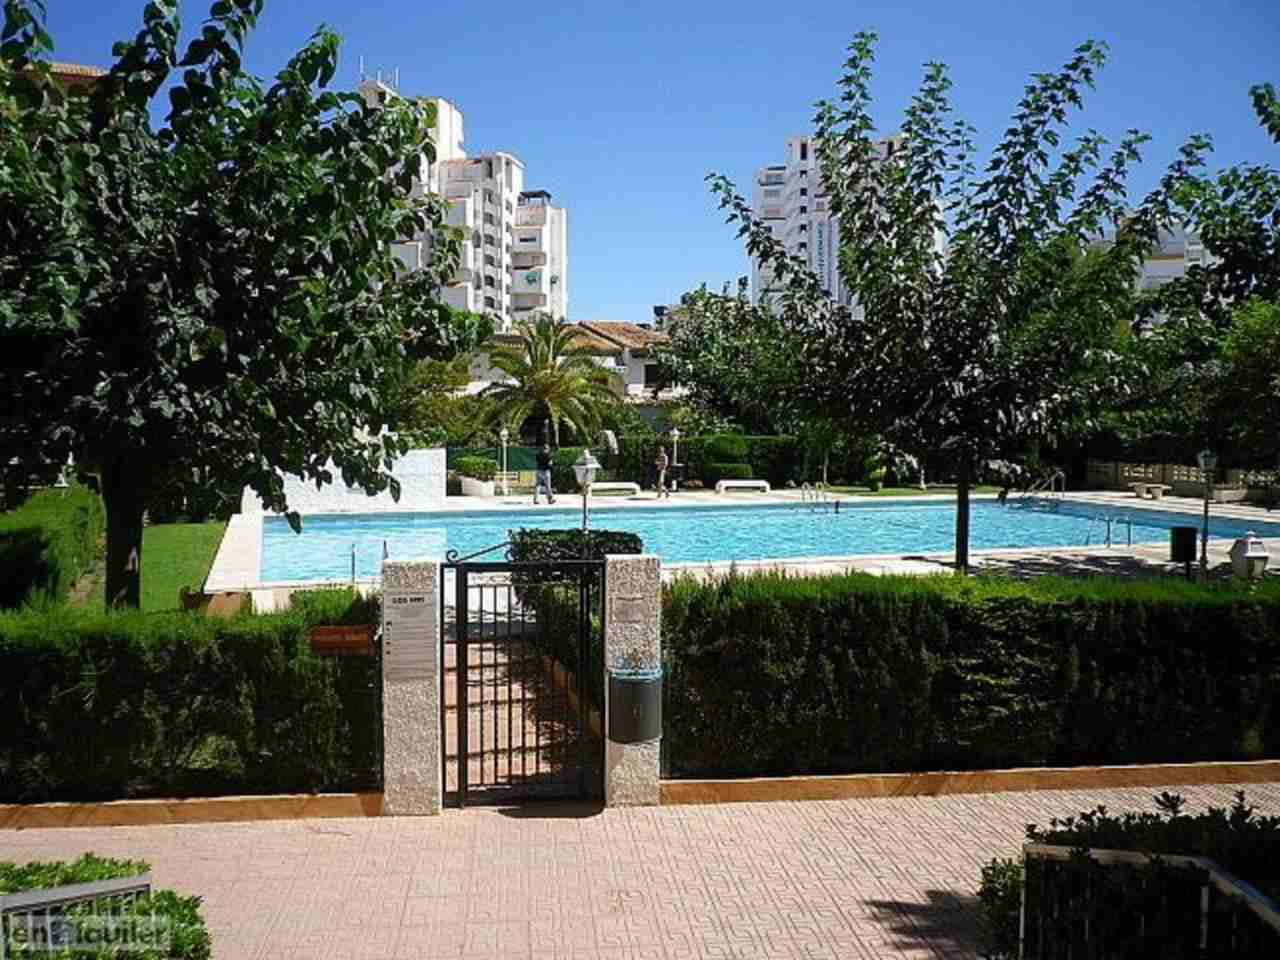 Casas vacacionales Grau i Platja, Valencia